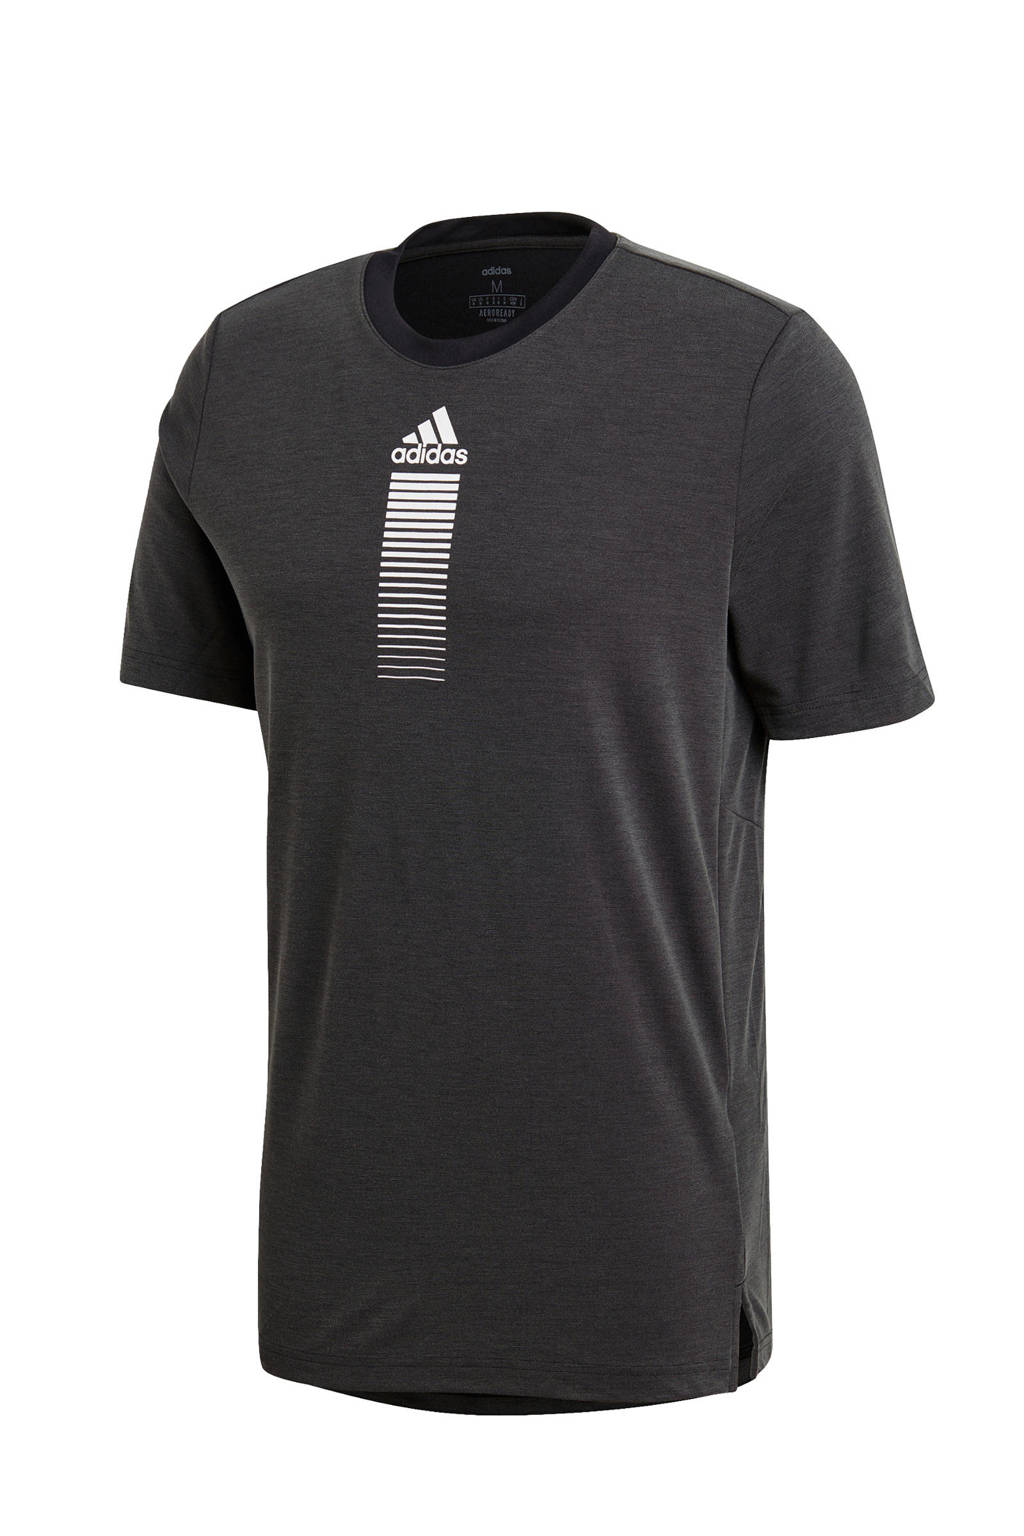 adidas Performance   sport T-shirt donkergrijs, Donkergrijs